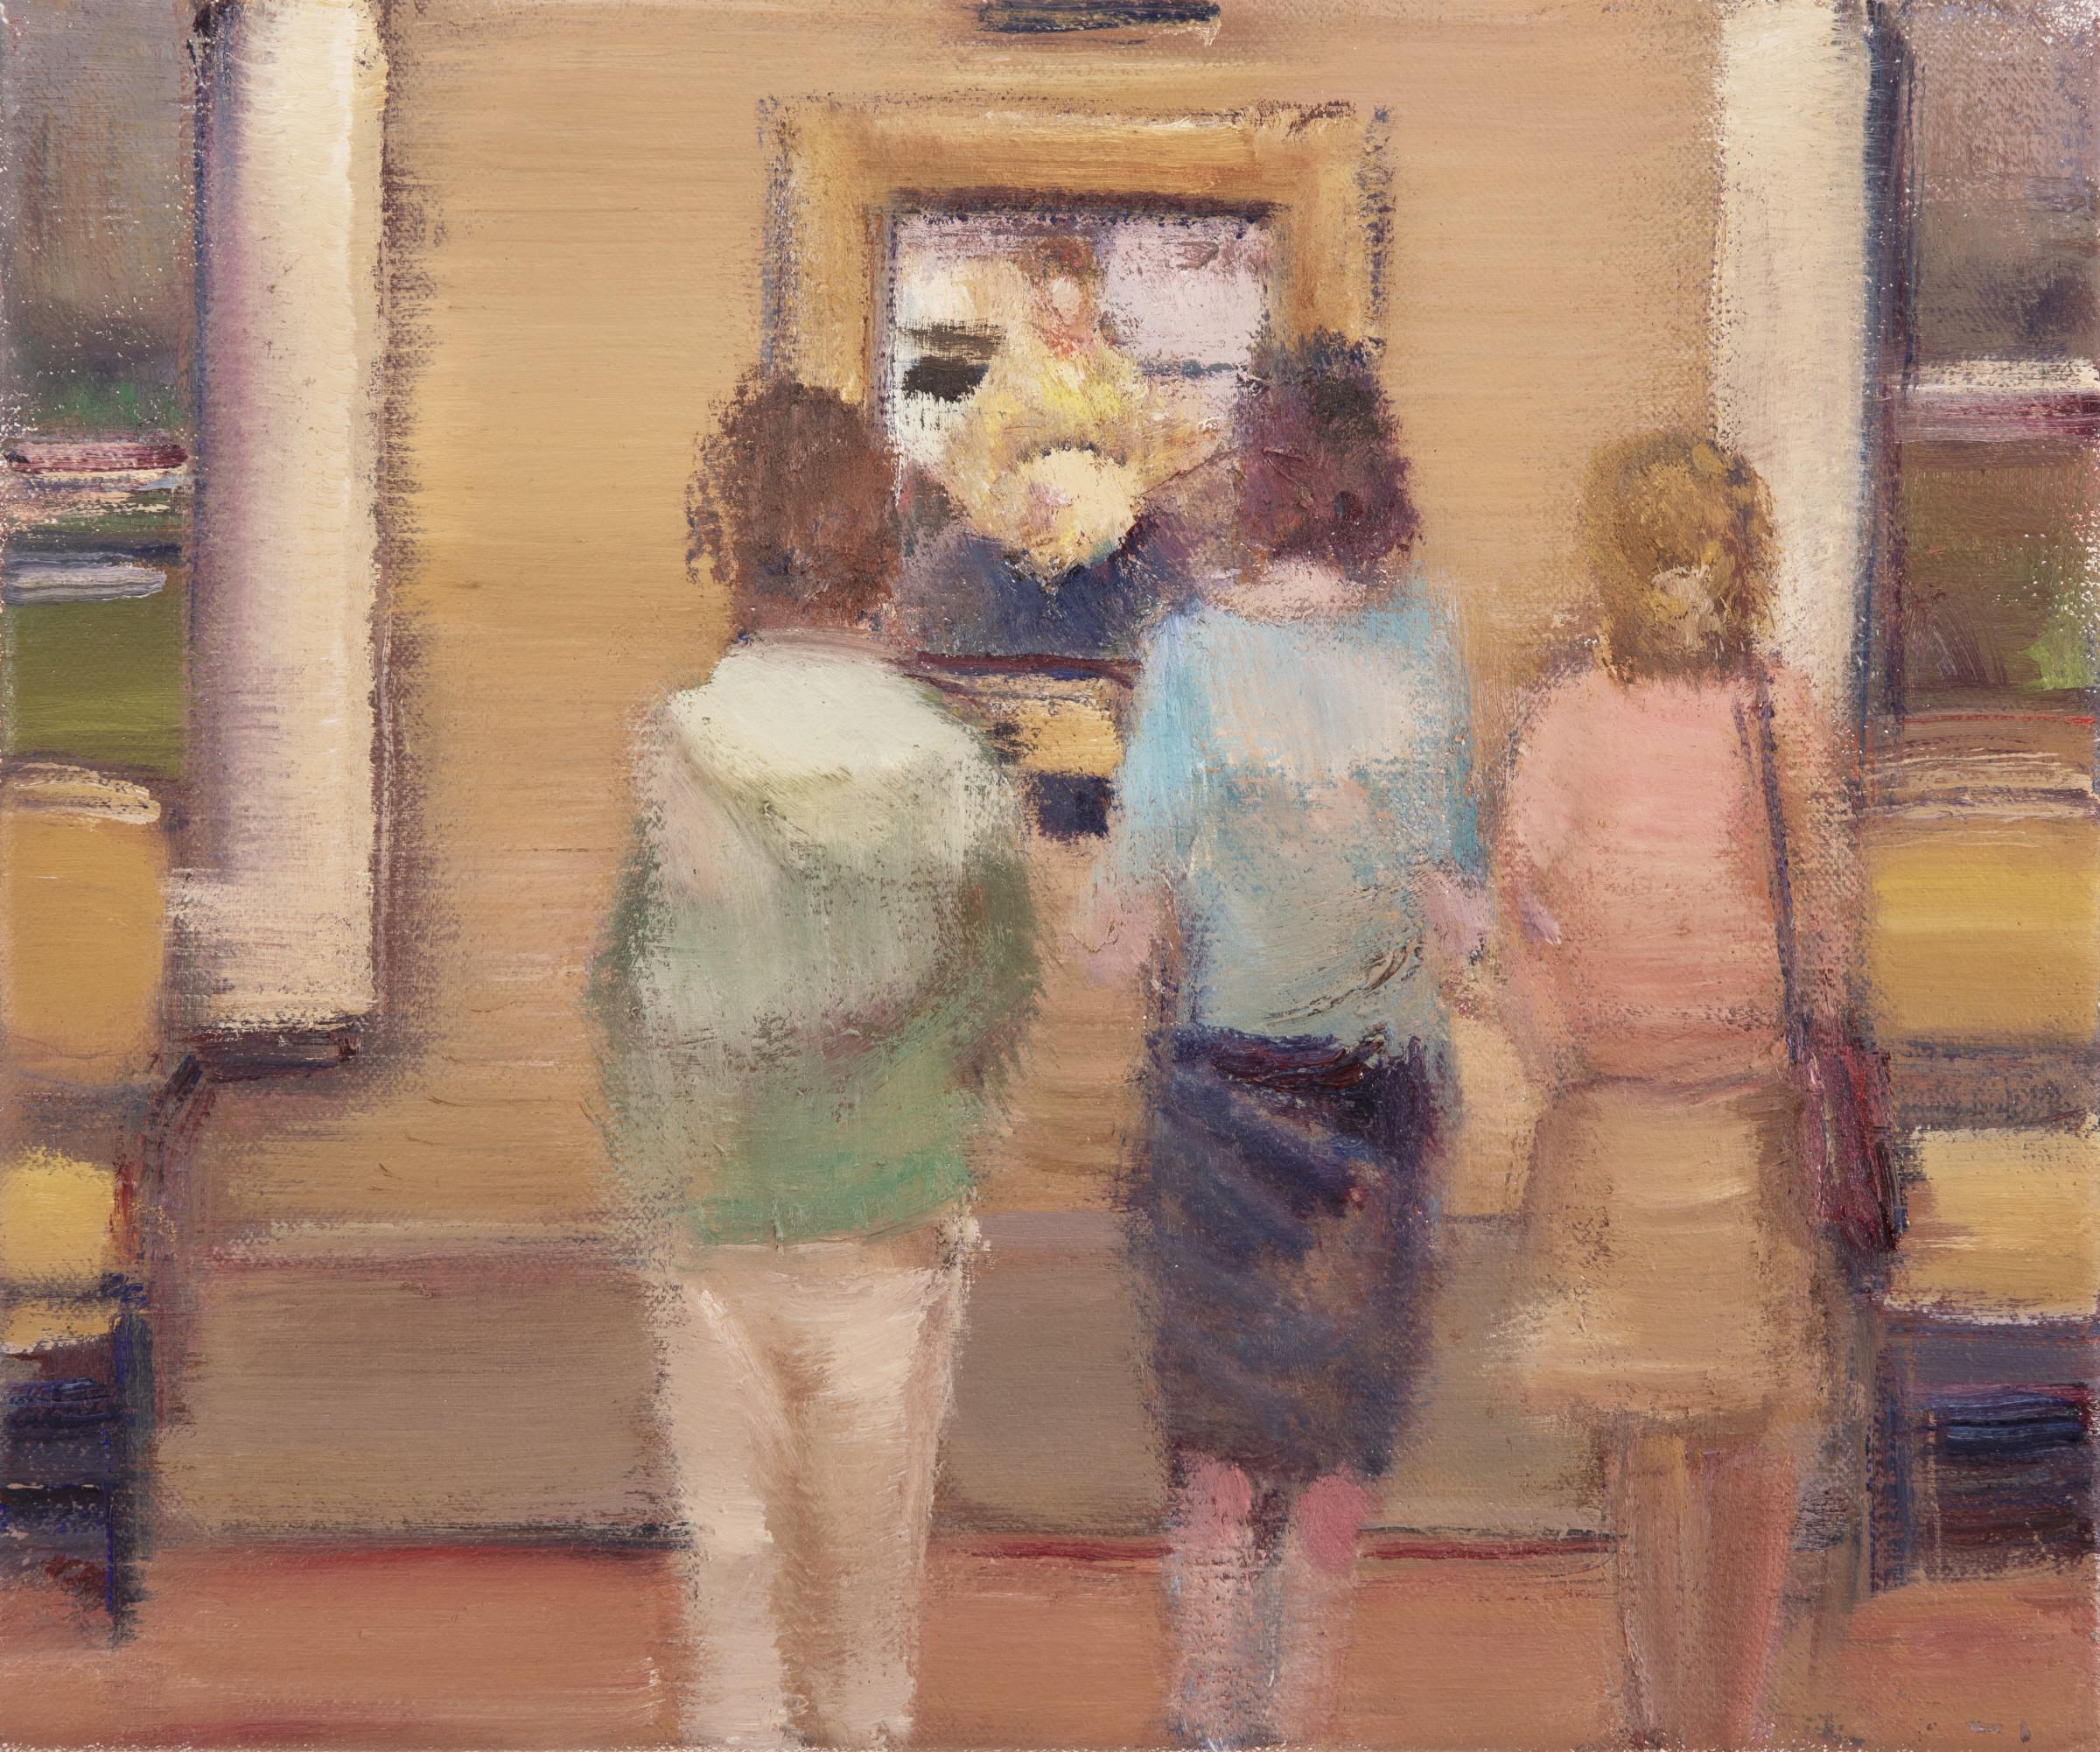 "<span class=""link fancybox-details-link""><a href=""/artists/59-simon-nicholas/works/548-simon-nicholas-kenwood-ii-2019/"">View Detail Page</a></span>Simon Nicholas   Kenwood II, 2019   Oil on Linen   12.5 x 10 inches  SOLD"